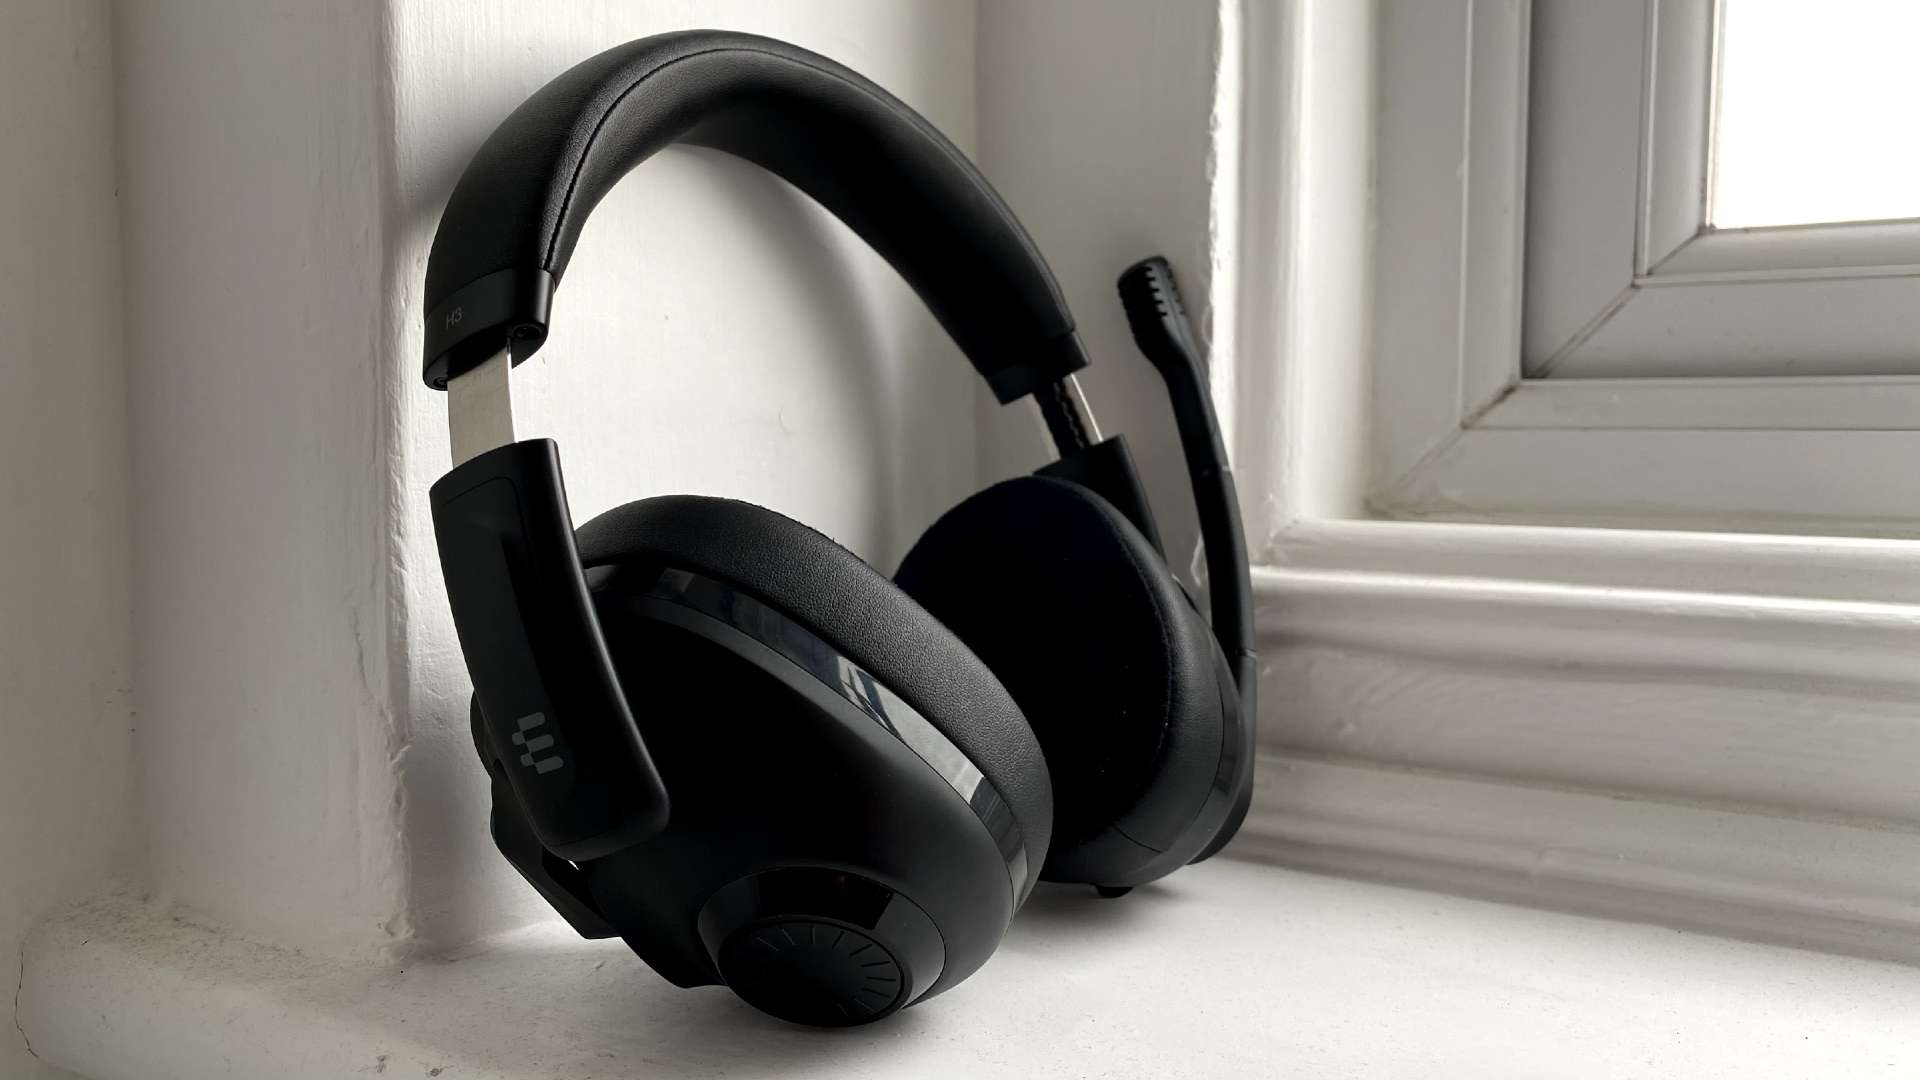 EPOS H3 gaming headset review – lightweight listening